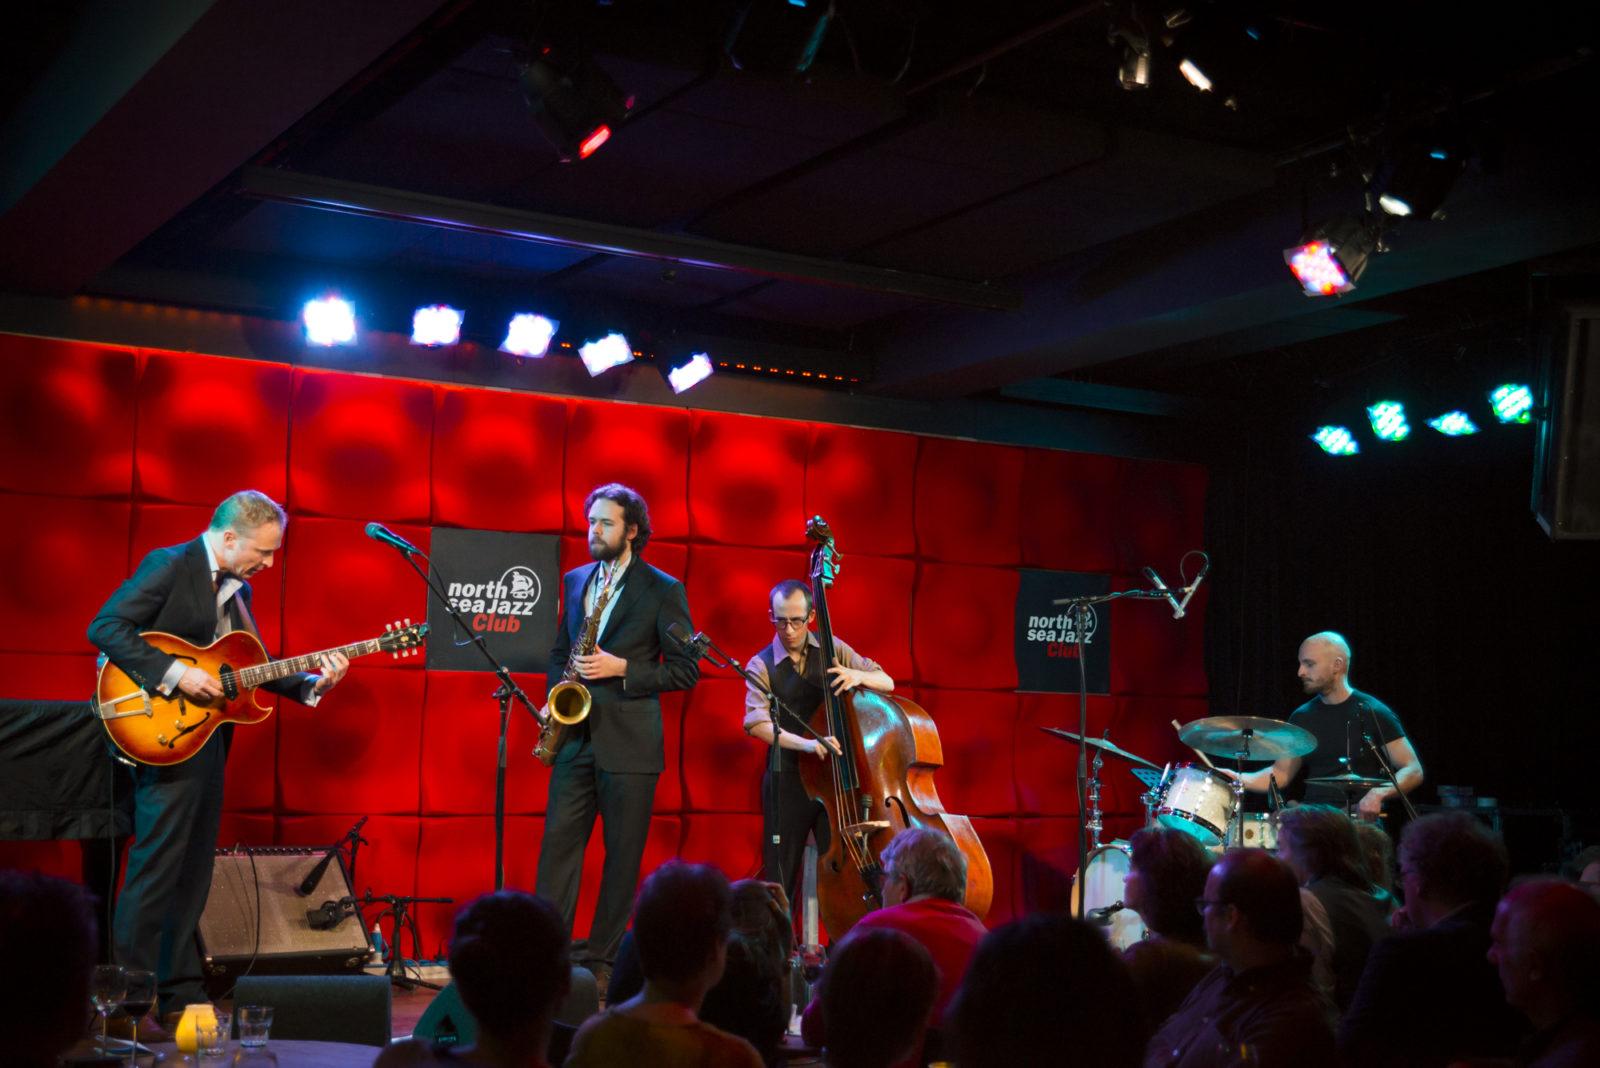 North Sea Jazz Club January 2014